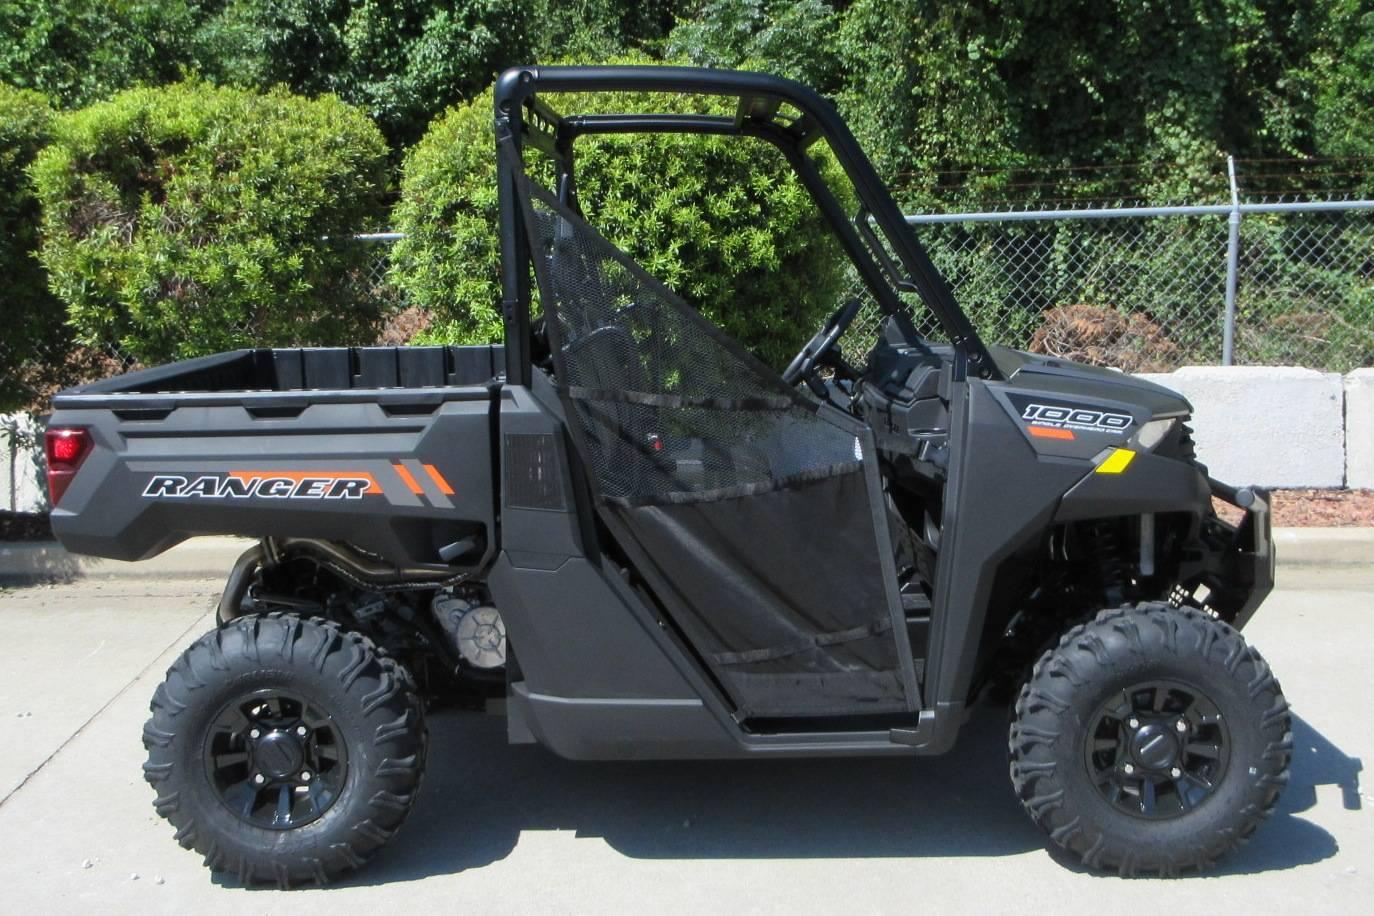 2020 Polaris Ranger 1000 Premium in Sumter, South Carolina